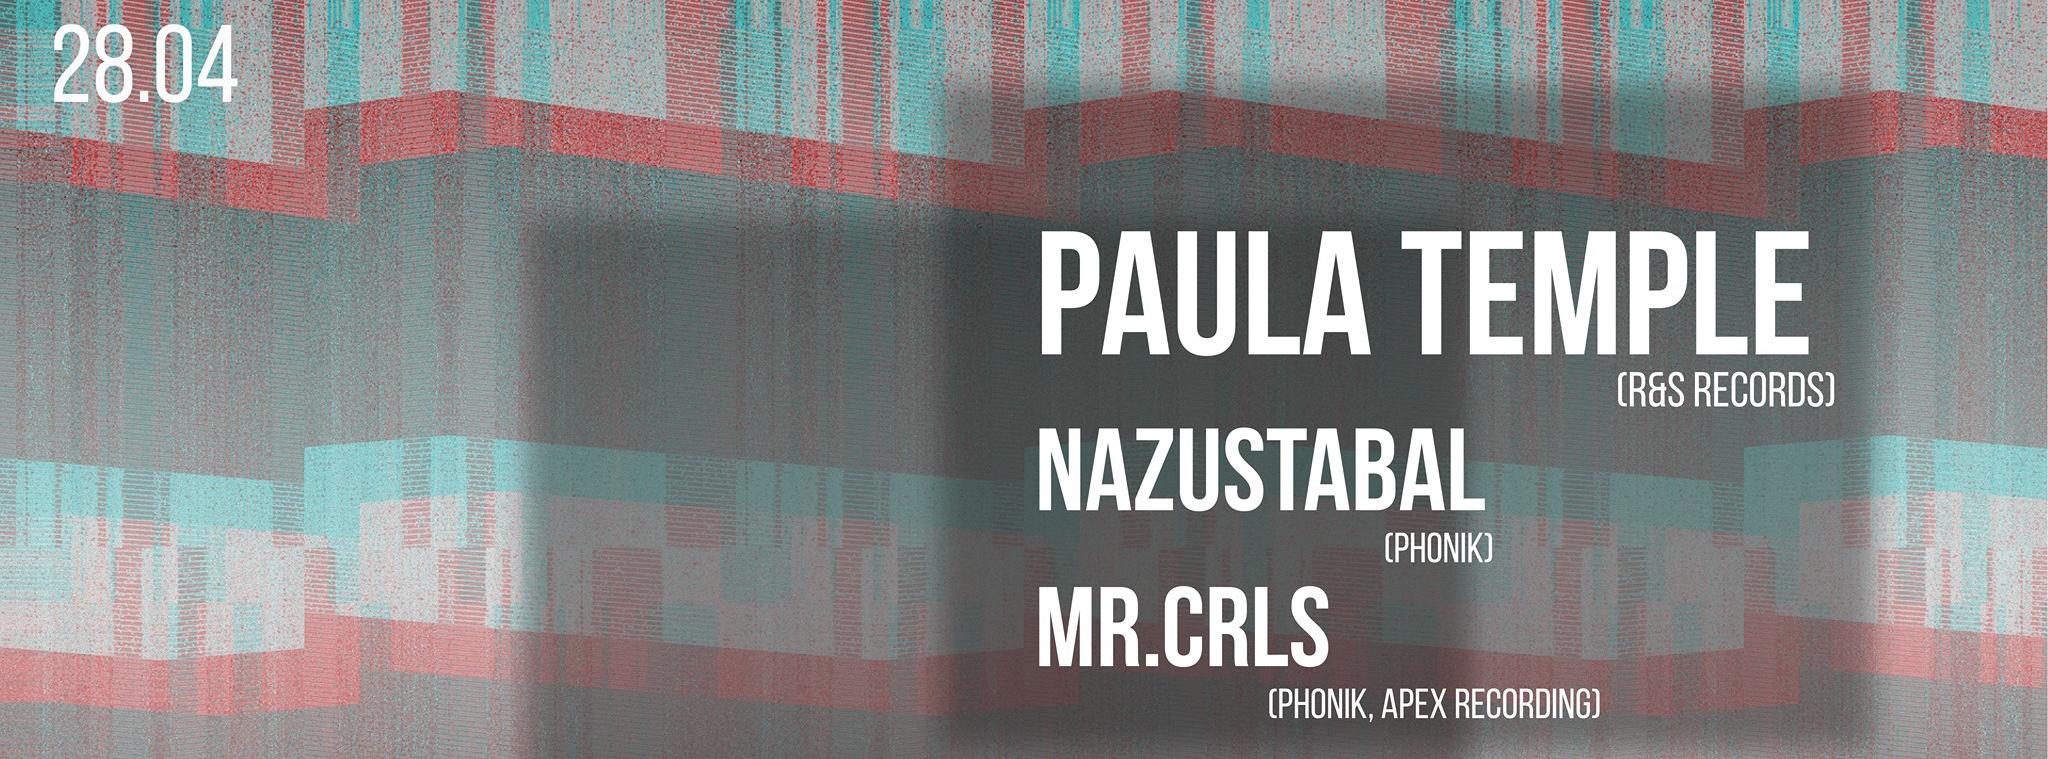 Phonik invite : Paula Temple (R&S Records)